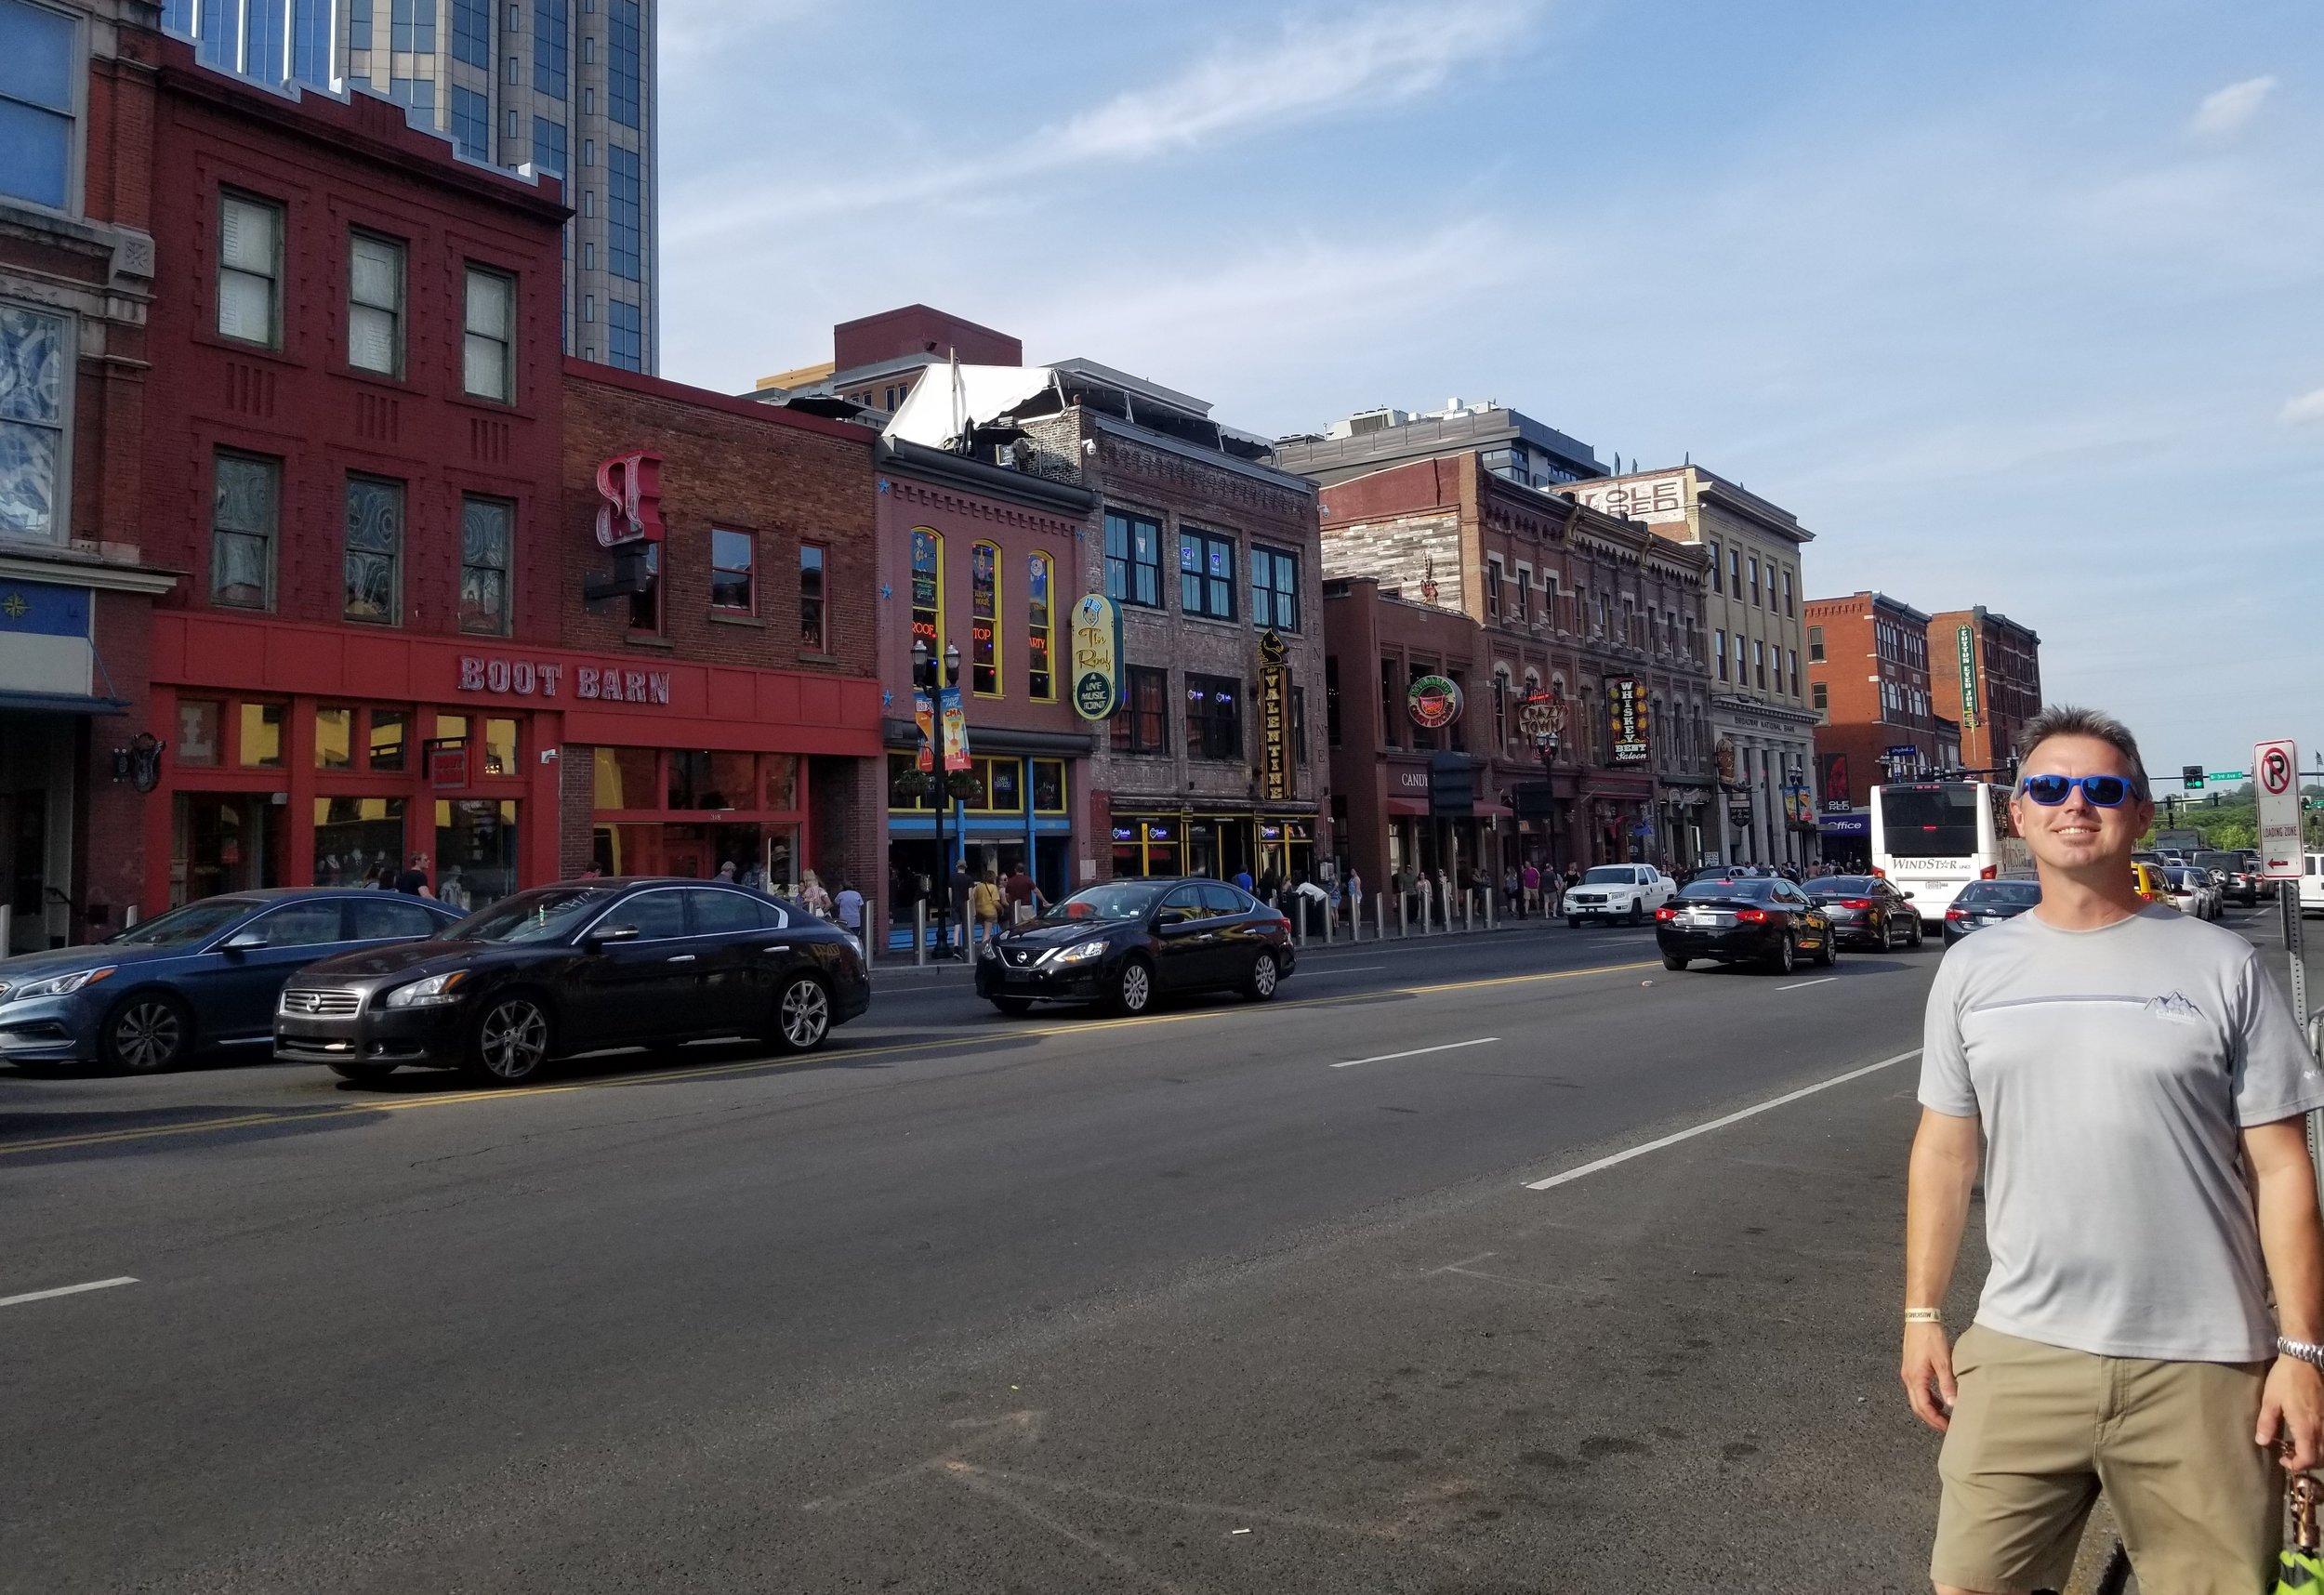 Downtown Nashville's Honky Tonk Highway